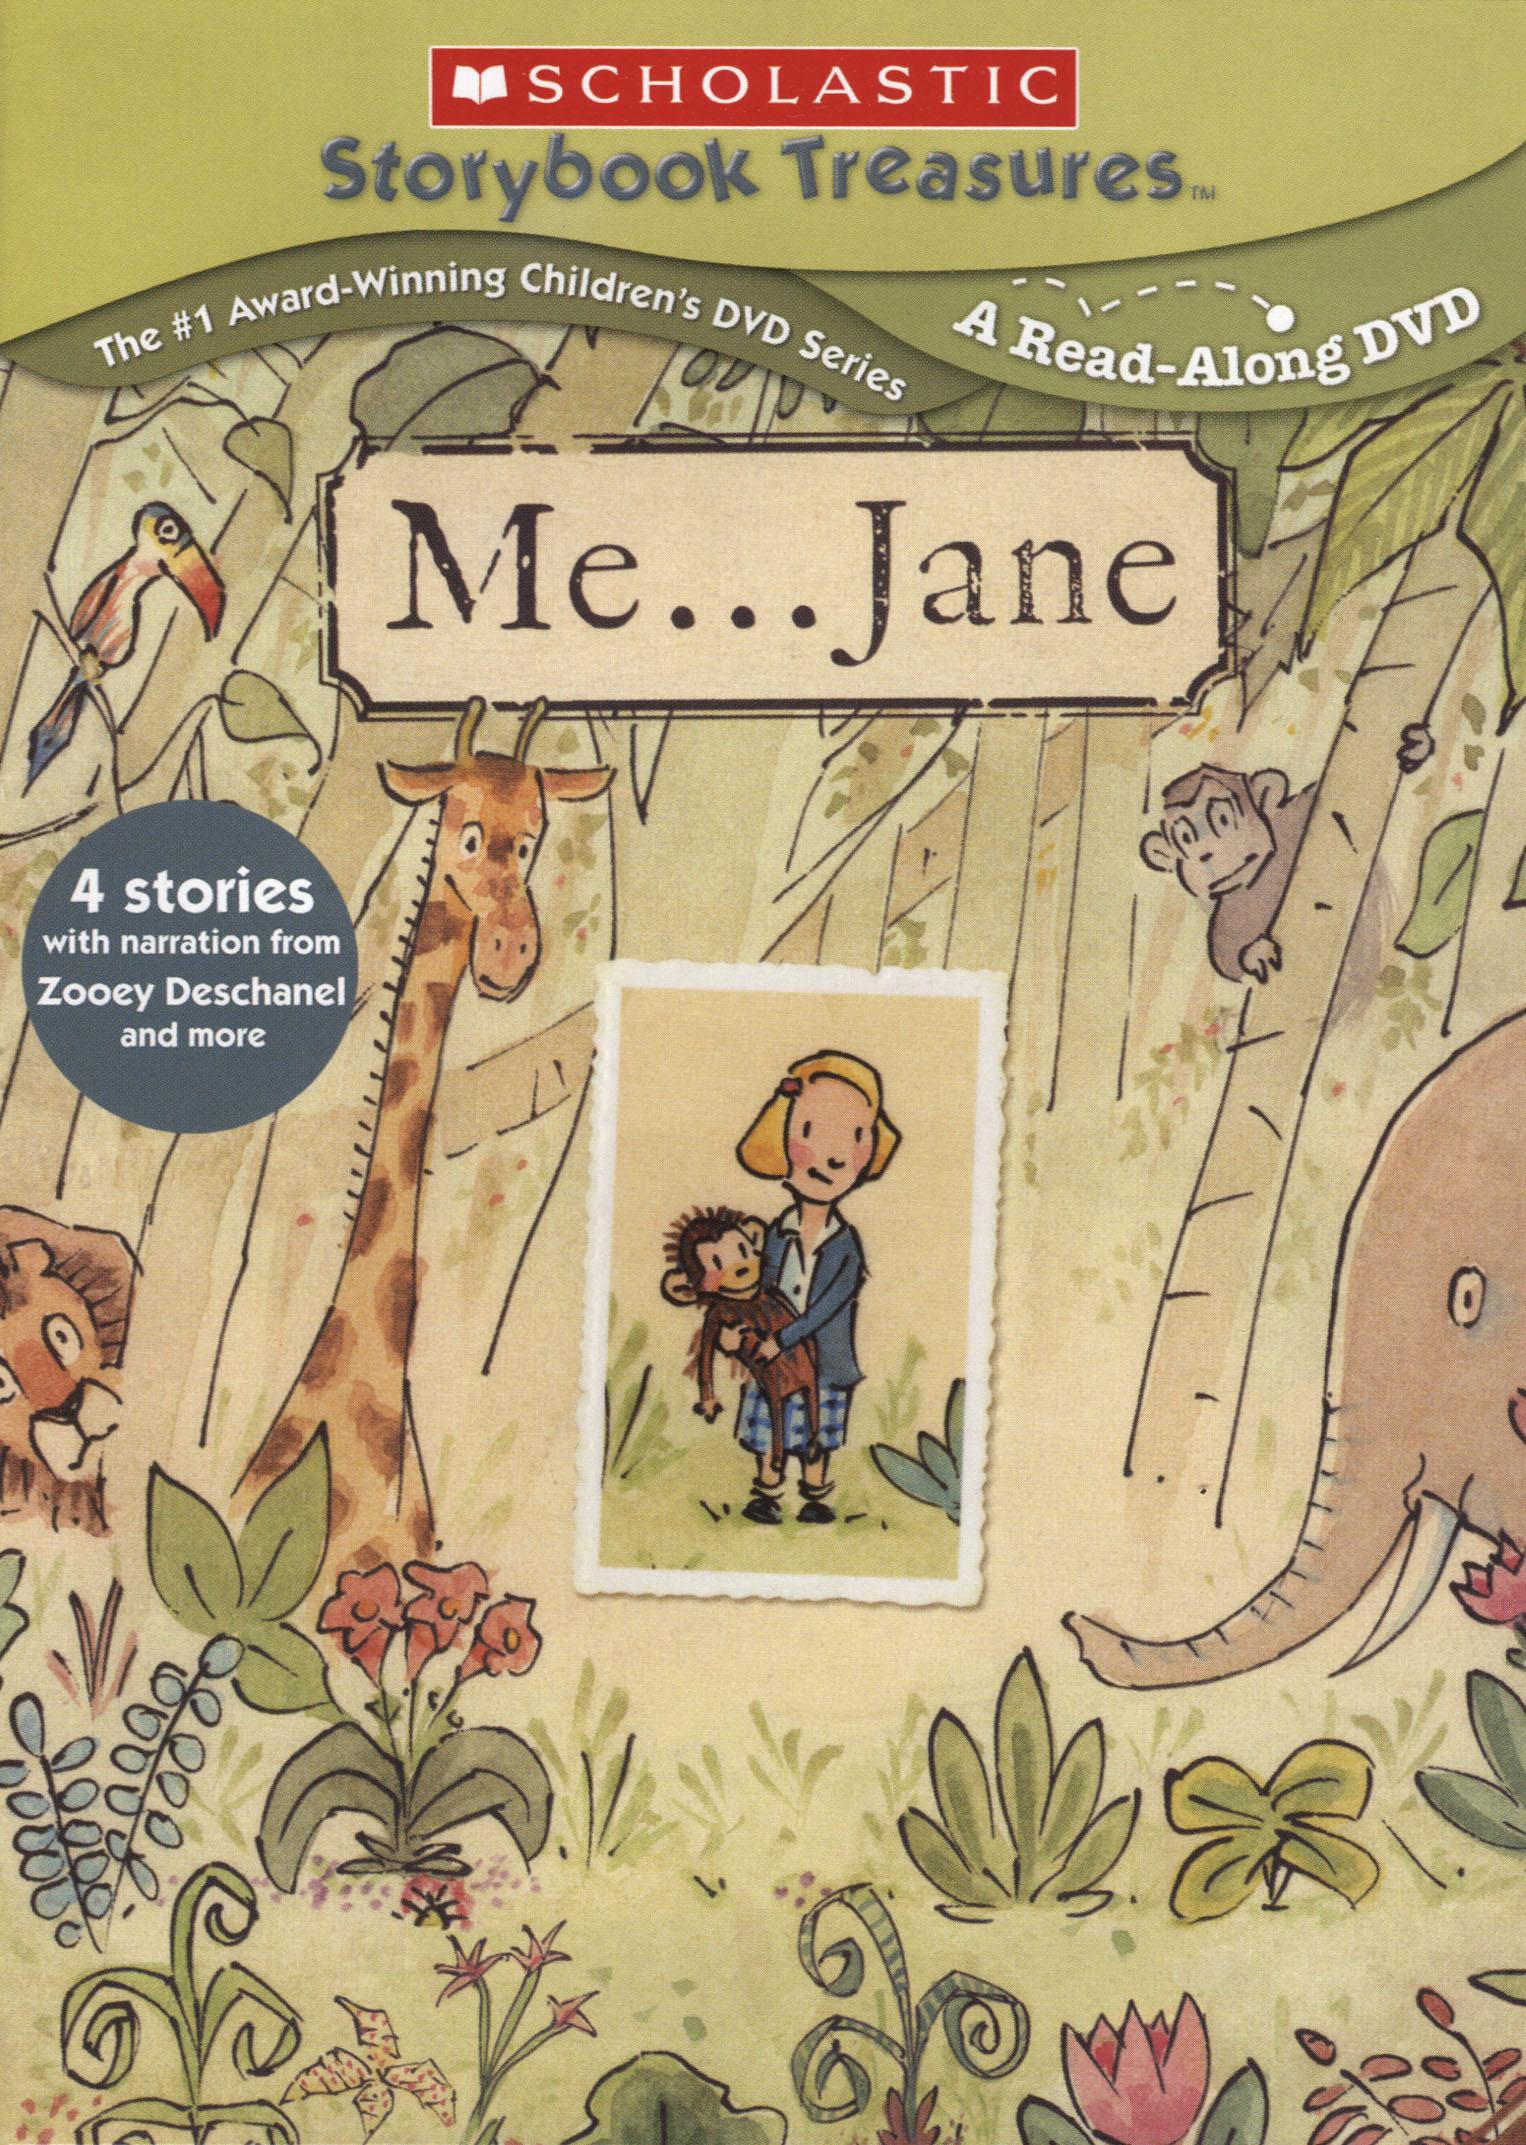 Scholastic Storybook Treasures: Me... Jane